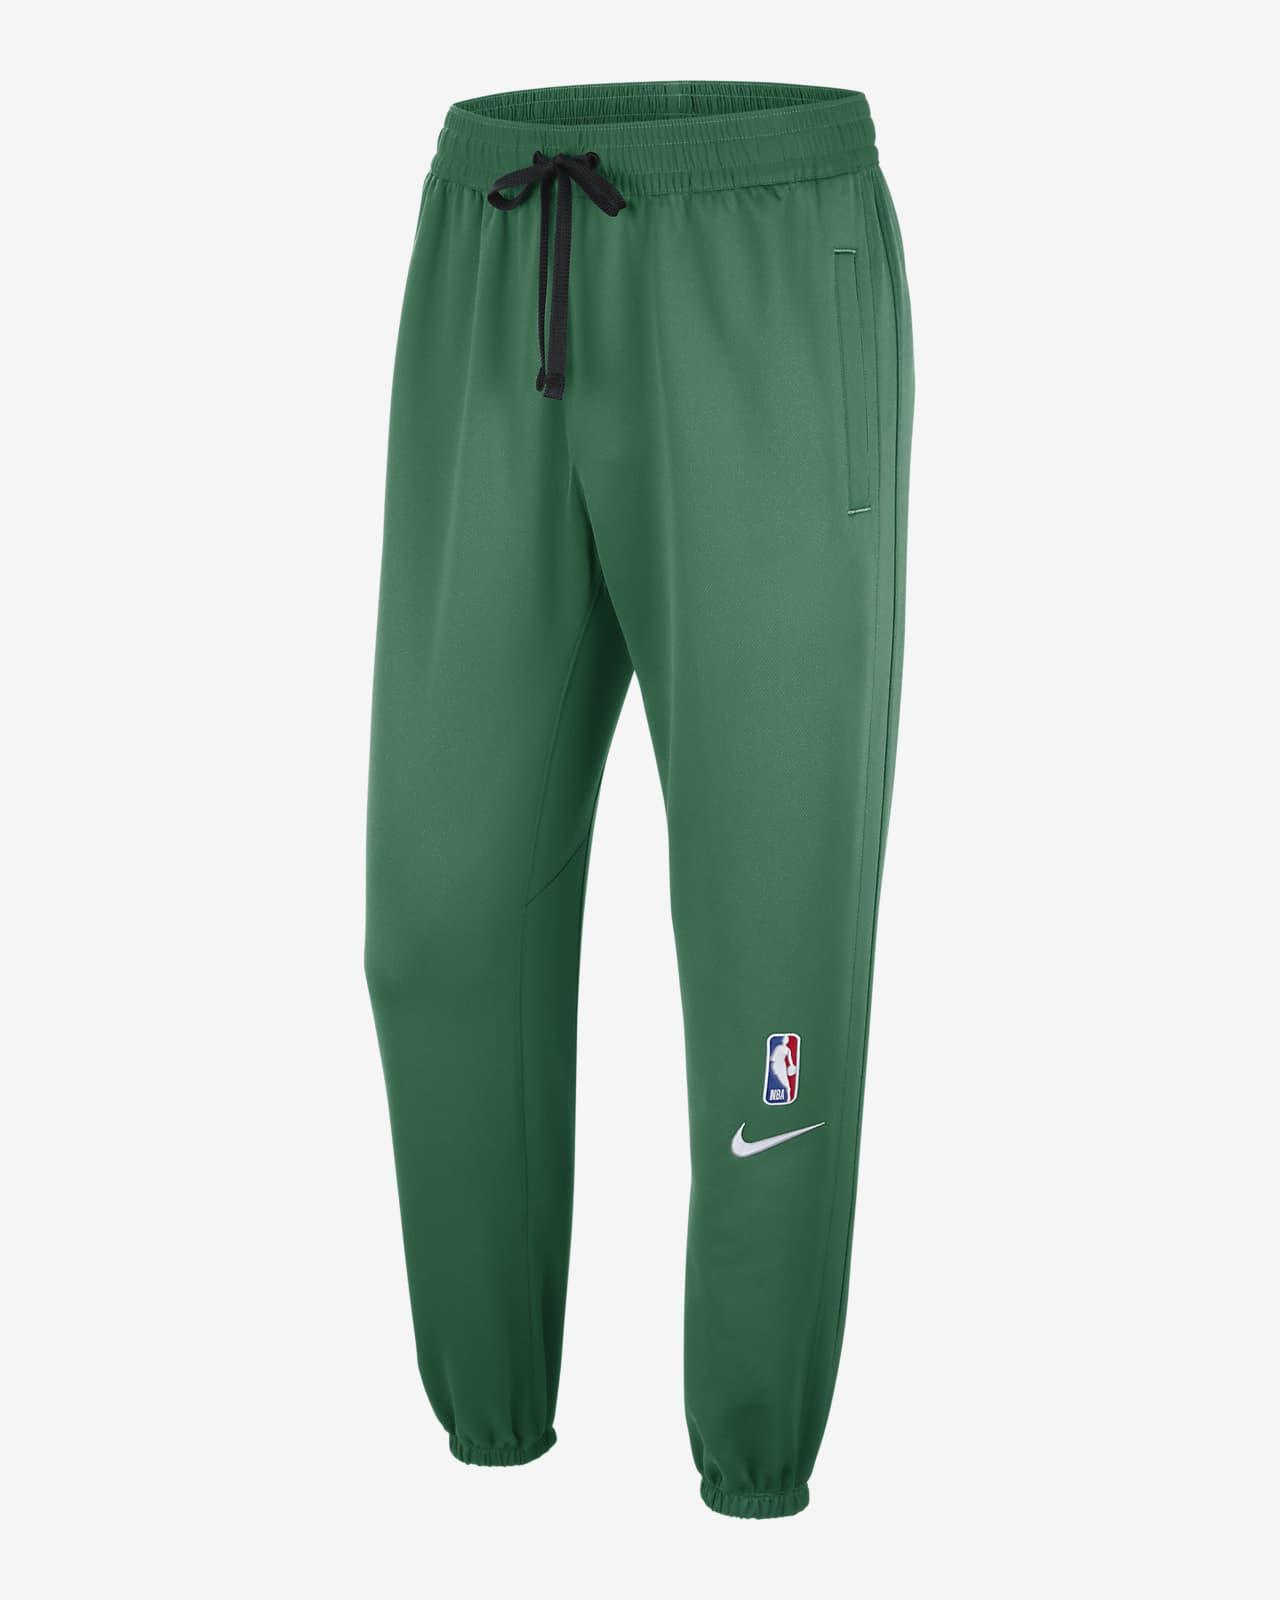 Pantalones de la NBA Nike Therma Flex para hombre Boston Celtics Showtime